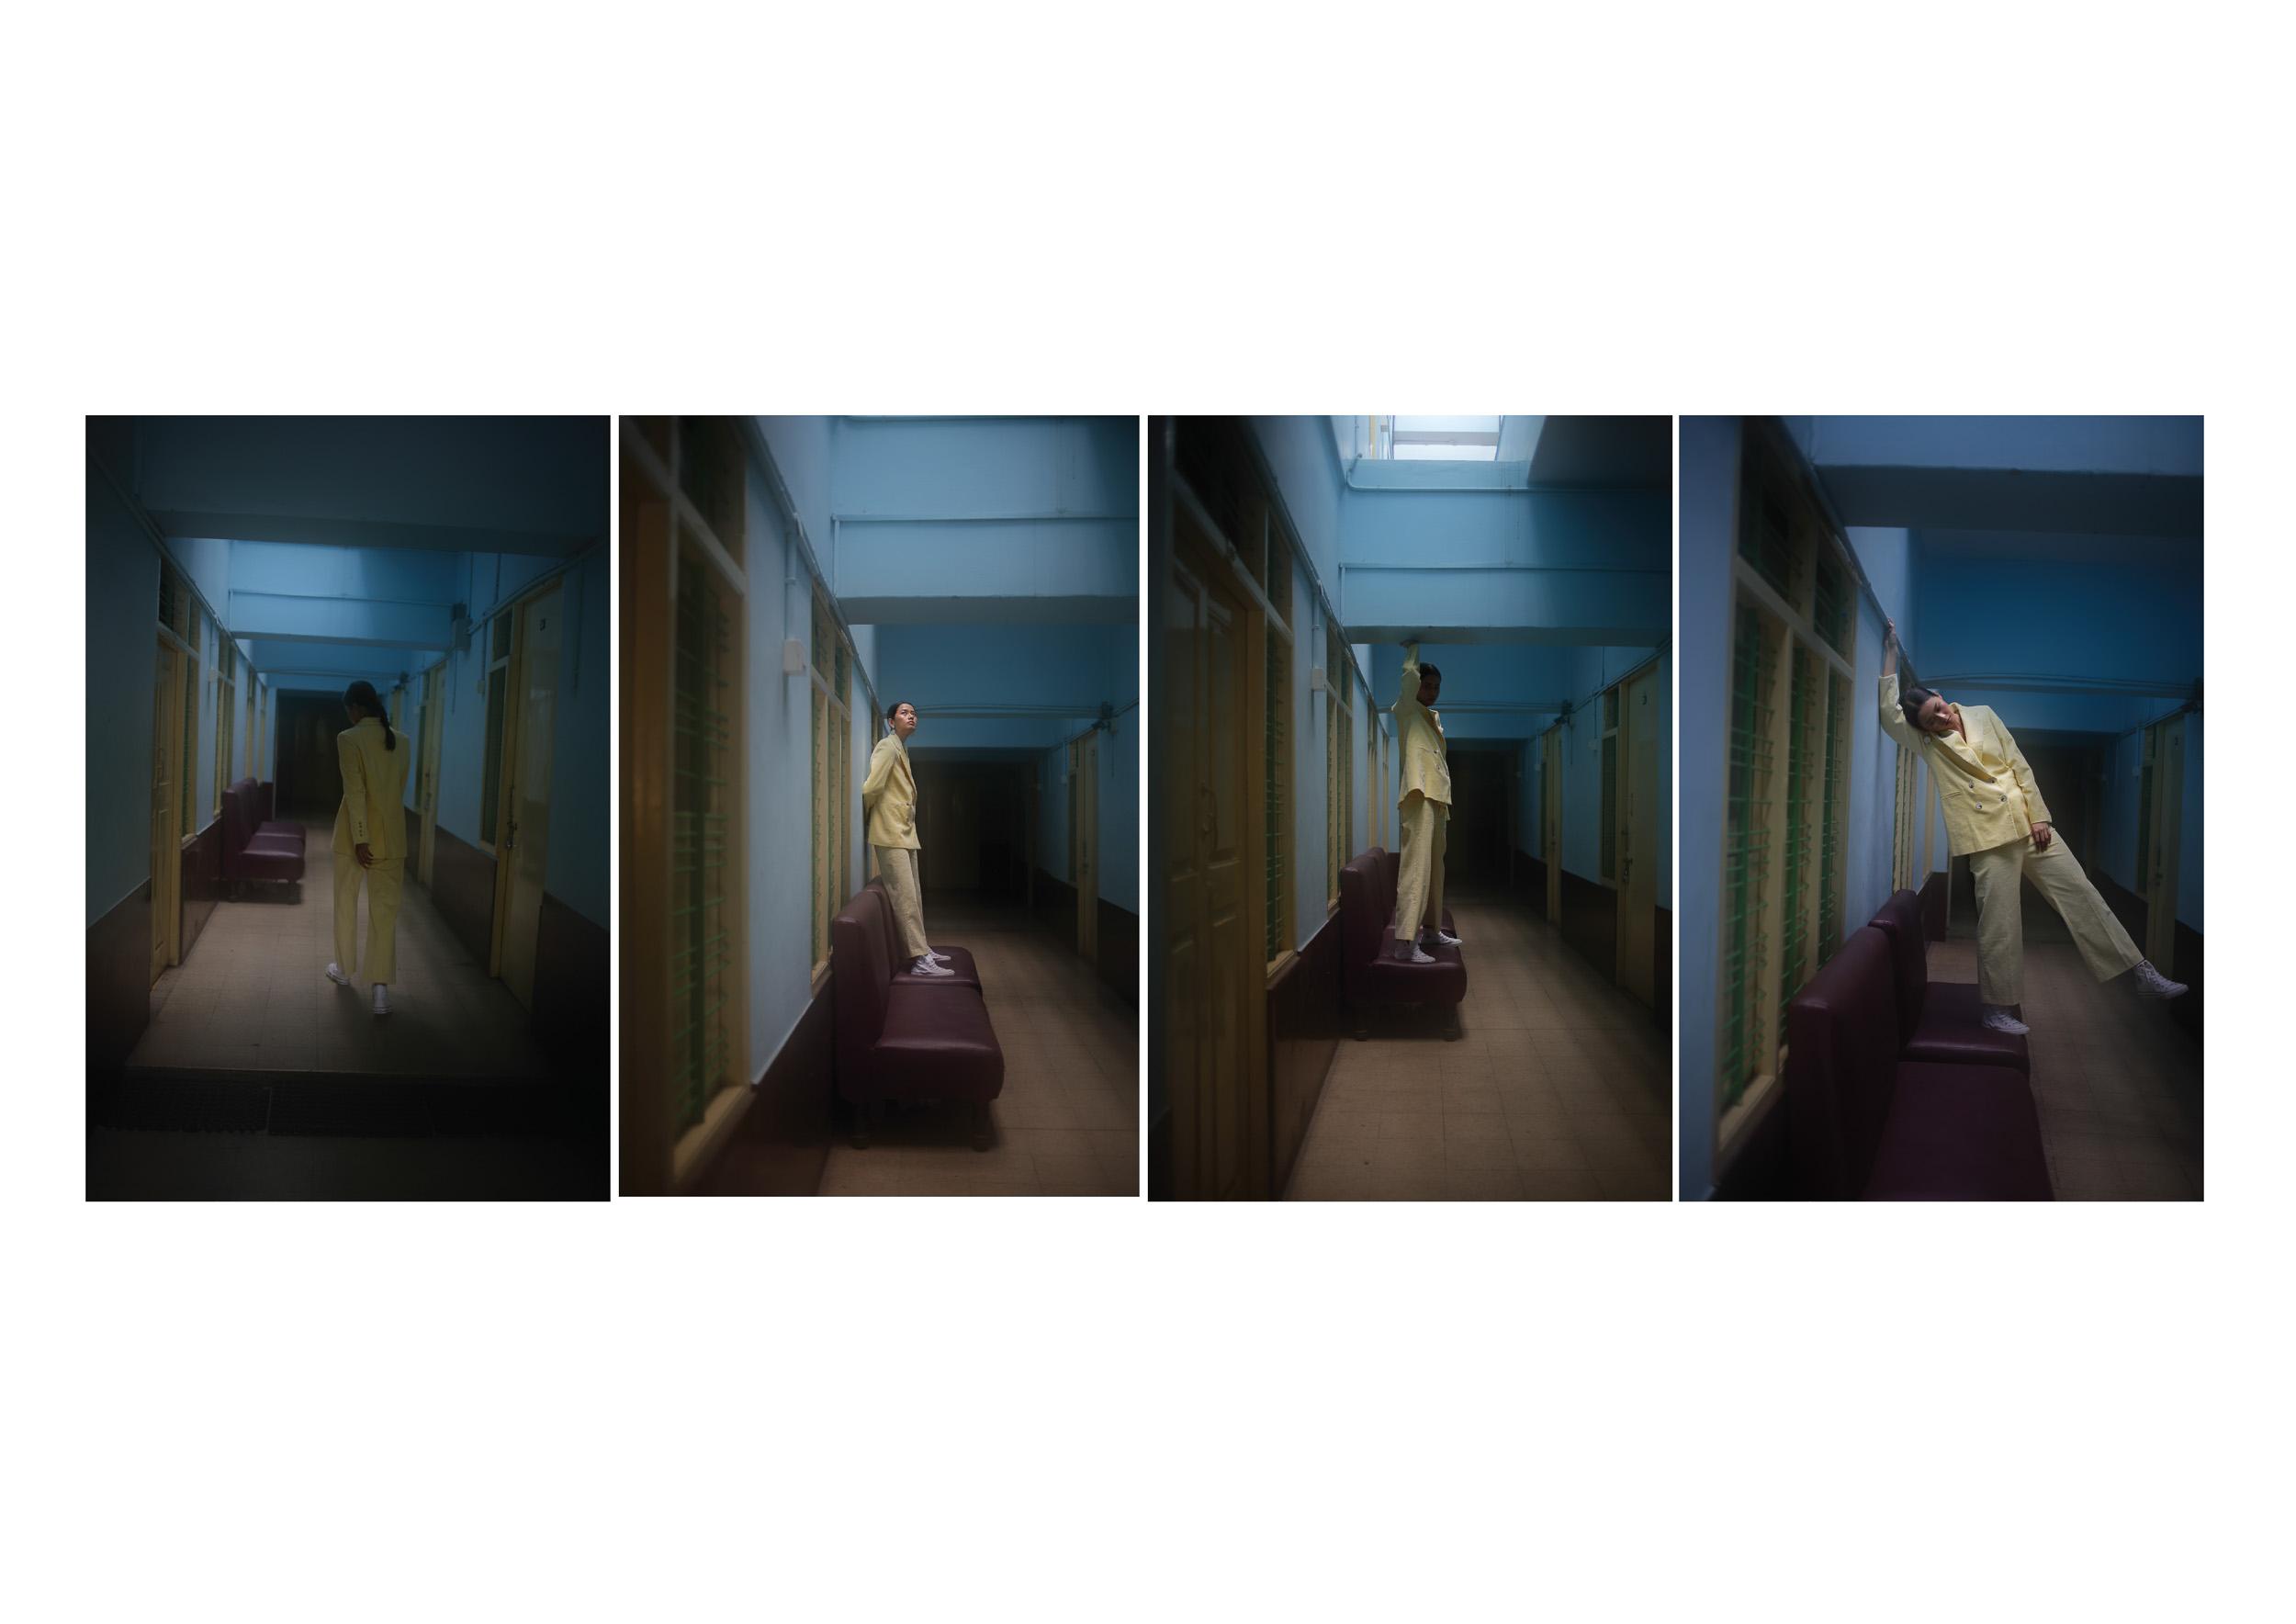 Sindhur_Photography_Fashion_StopTheExcuses-9.JPG